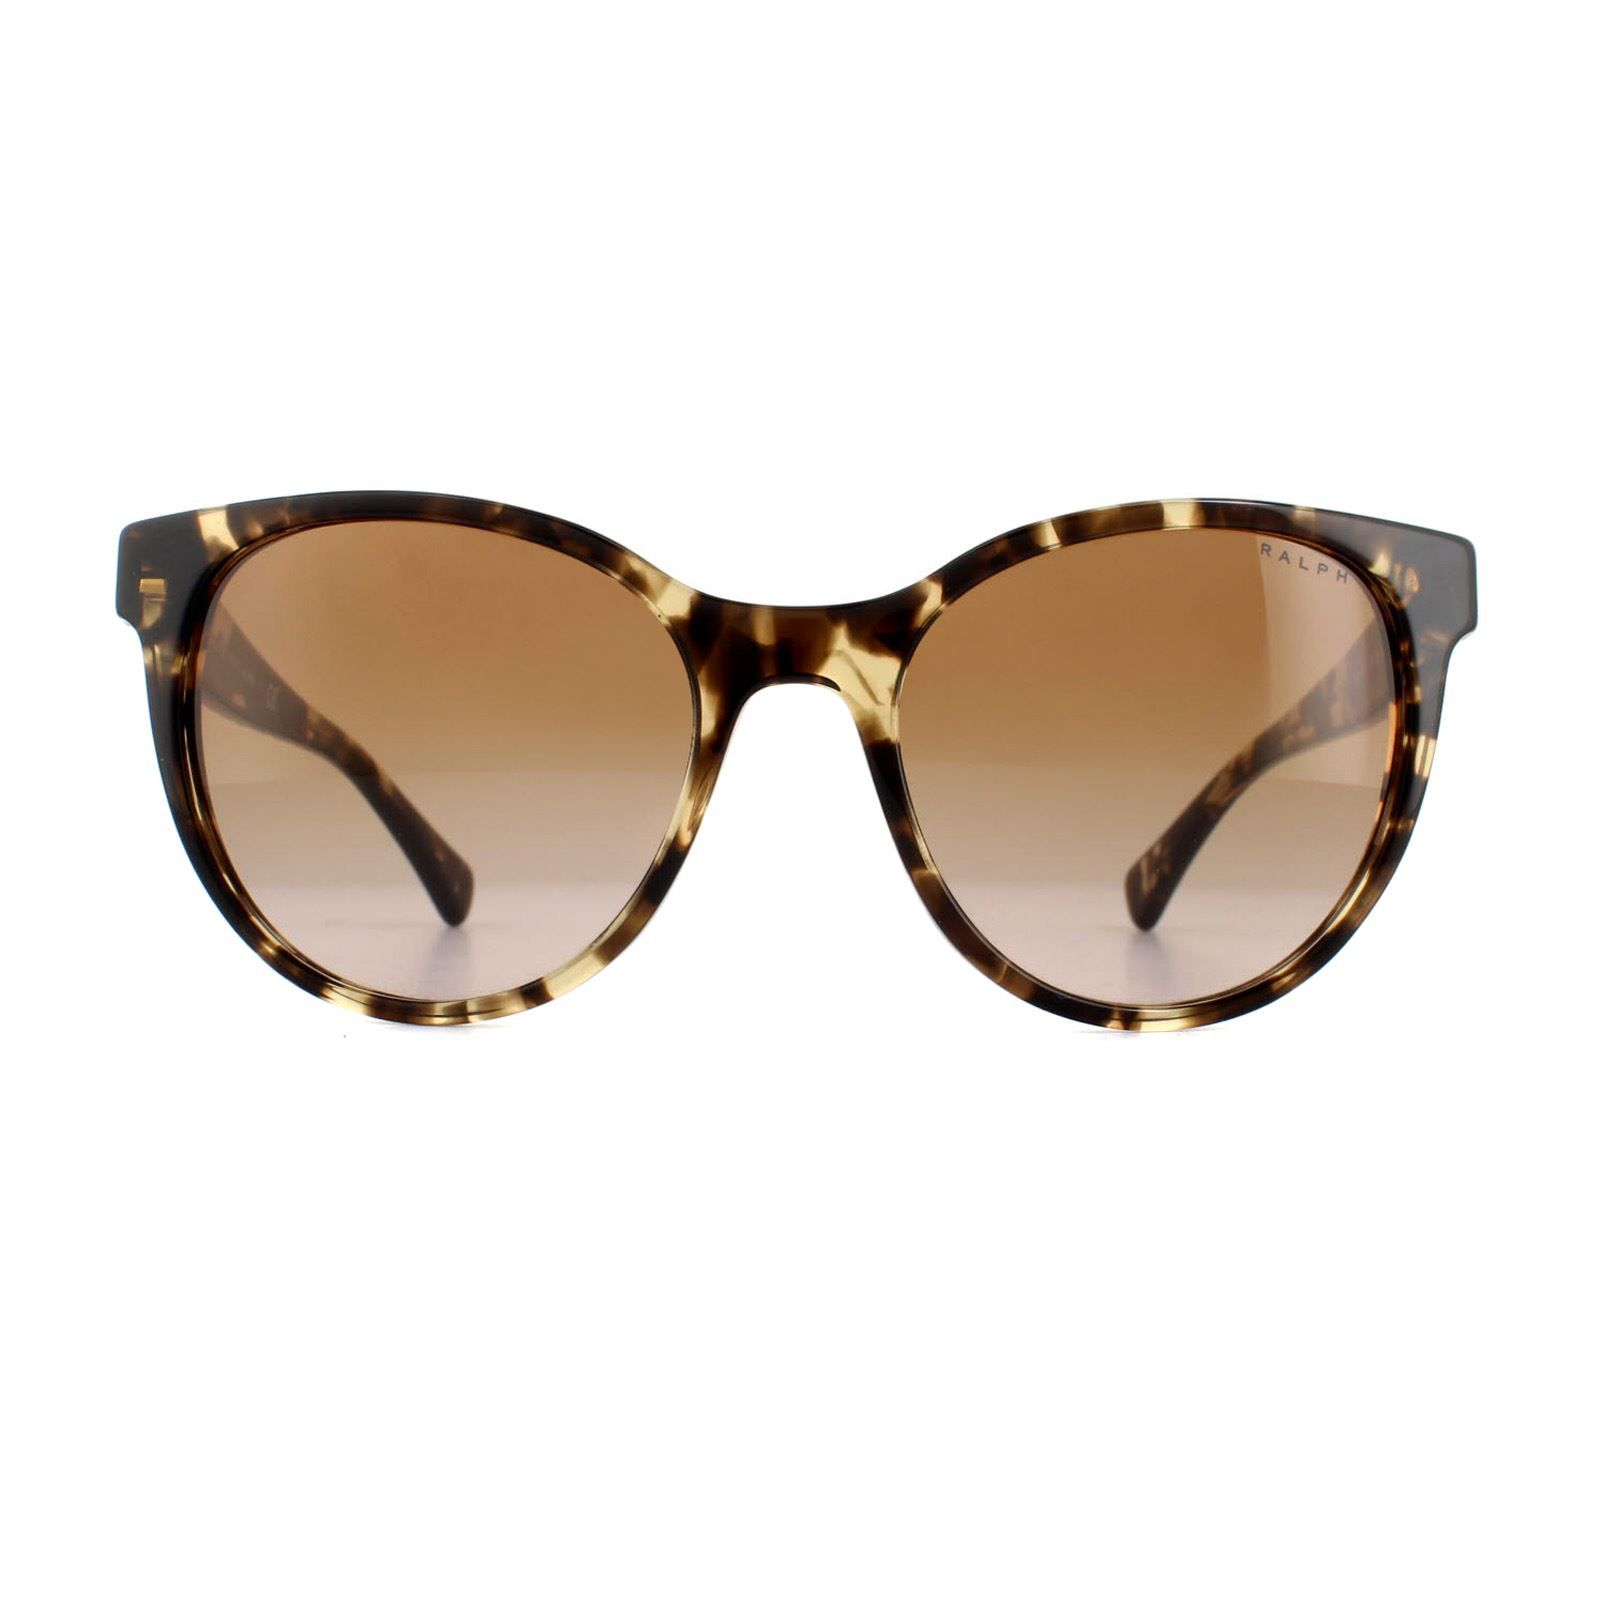 Ralph by Ralph Lauren Sunglasses RA5250 169113 Light Havana Brown Gradient